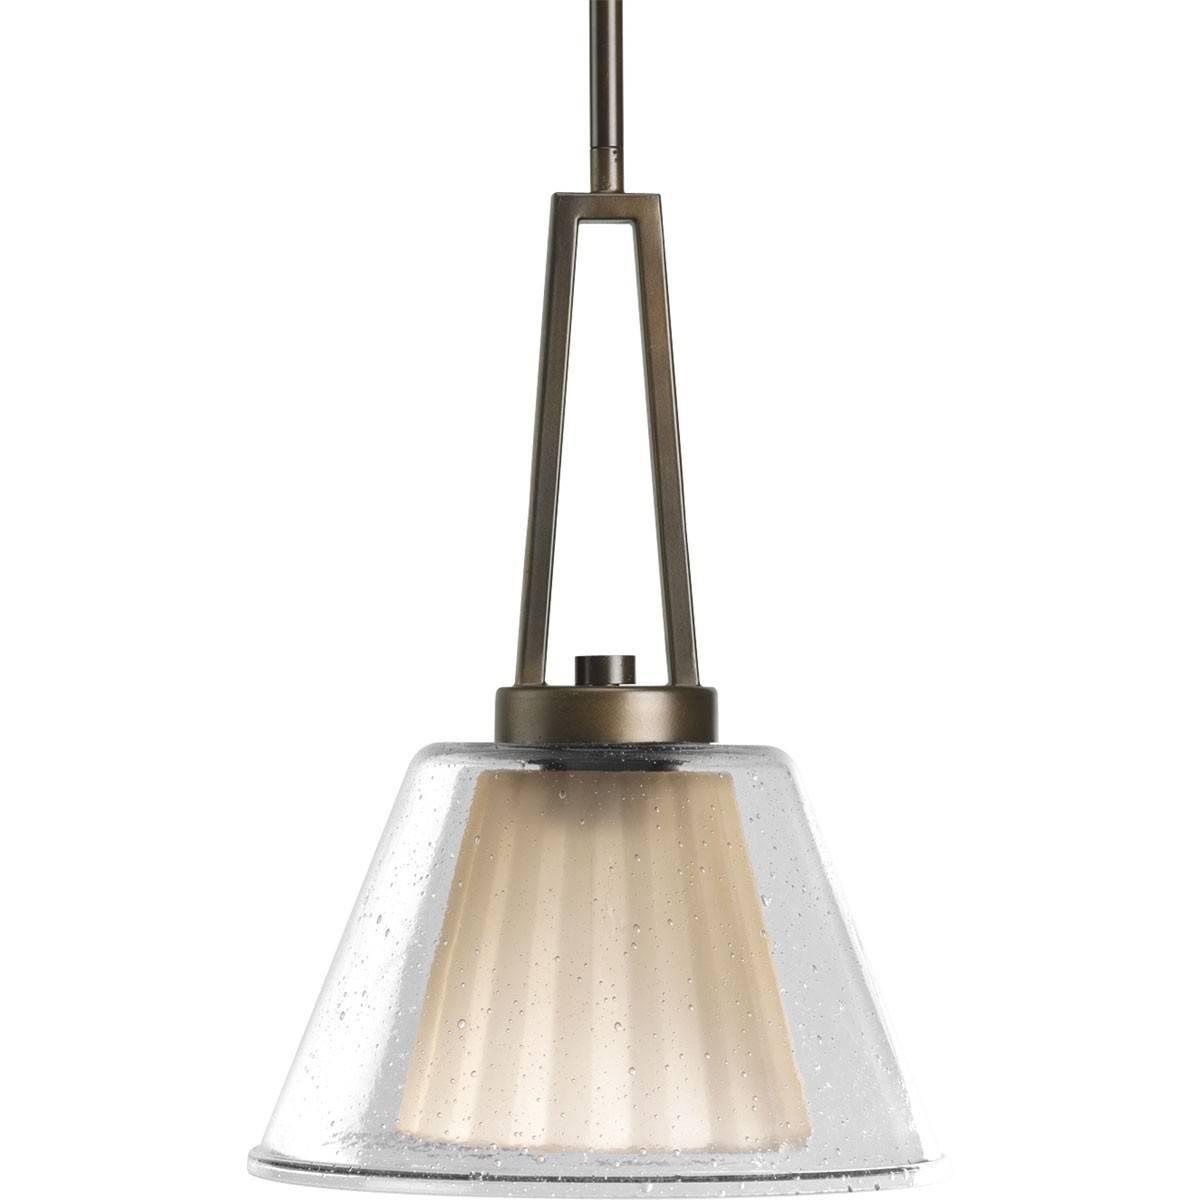 Stylish Mini Pendant Light Shades   Best Home Decor Inspirations inside Unique Mini Pendant Lights (Image 9 of 15)